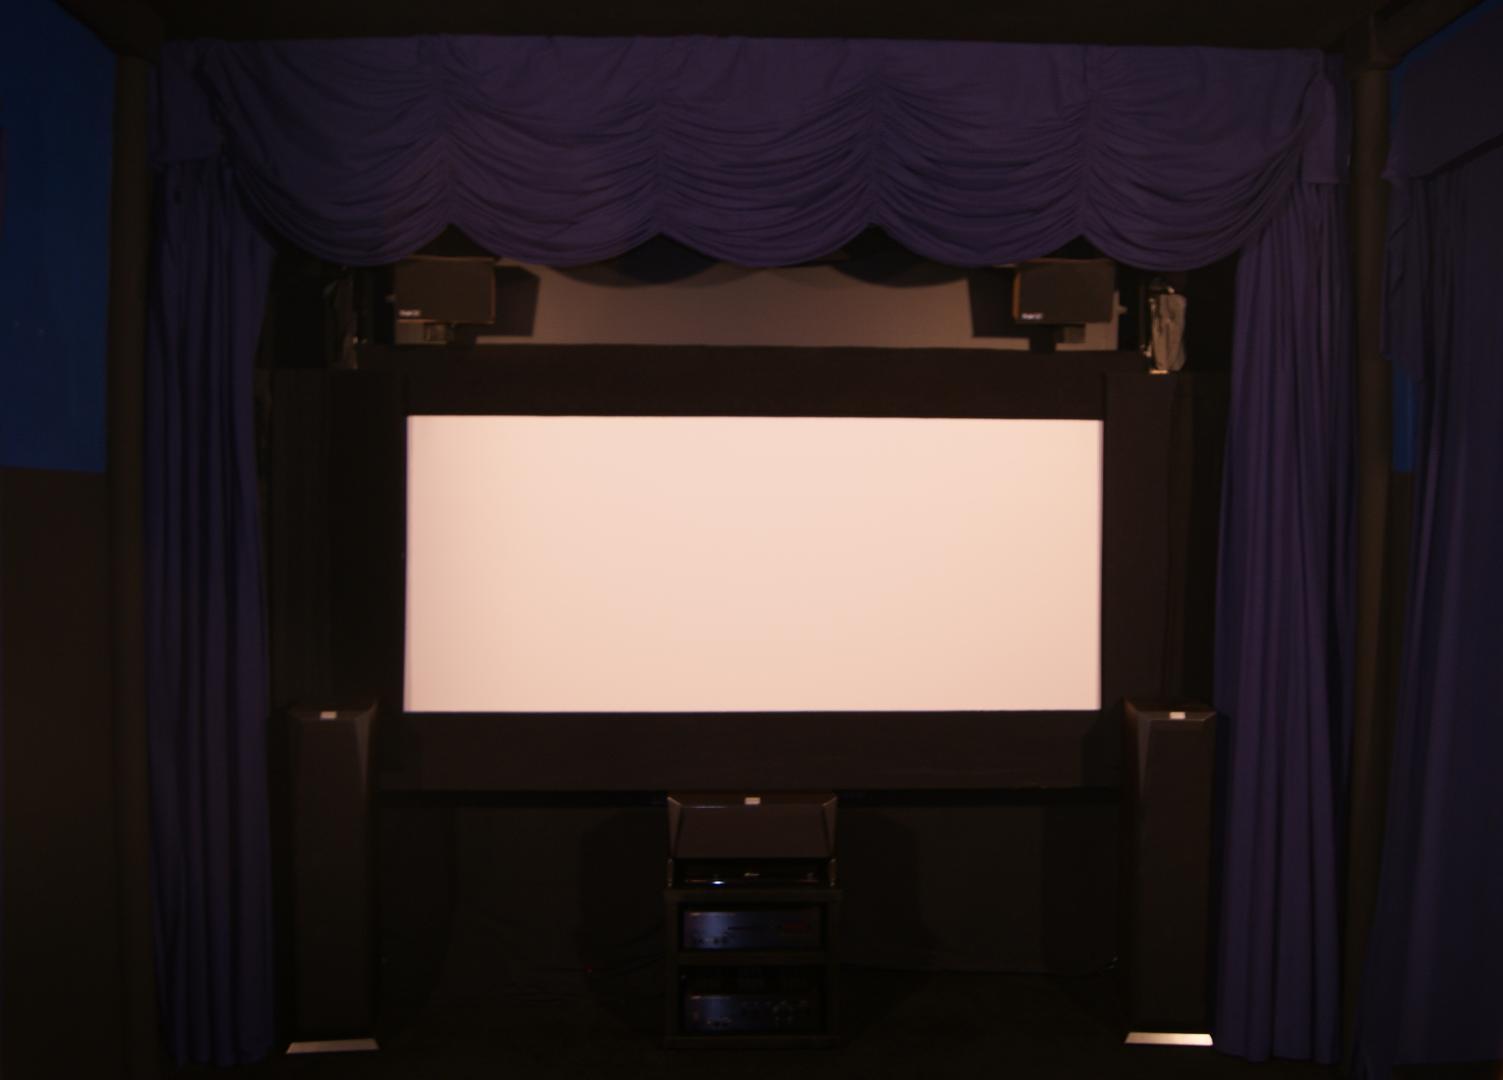 Bild 2 von Trarpalast - Berlin Screening Room inkl.  Salon Flügel